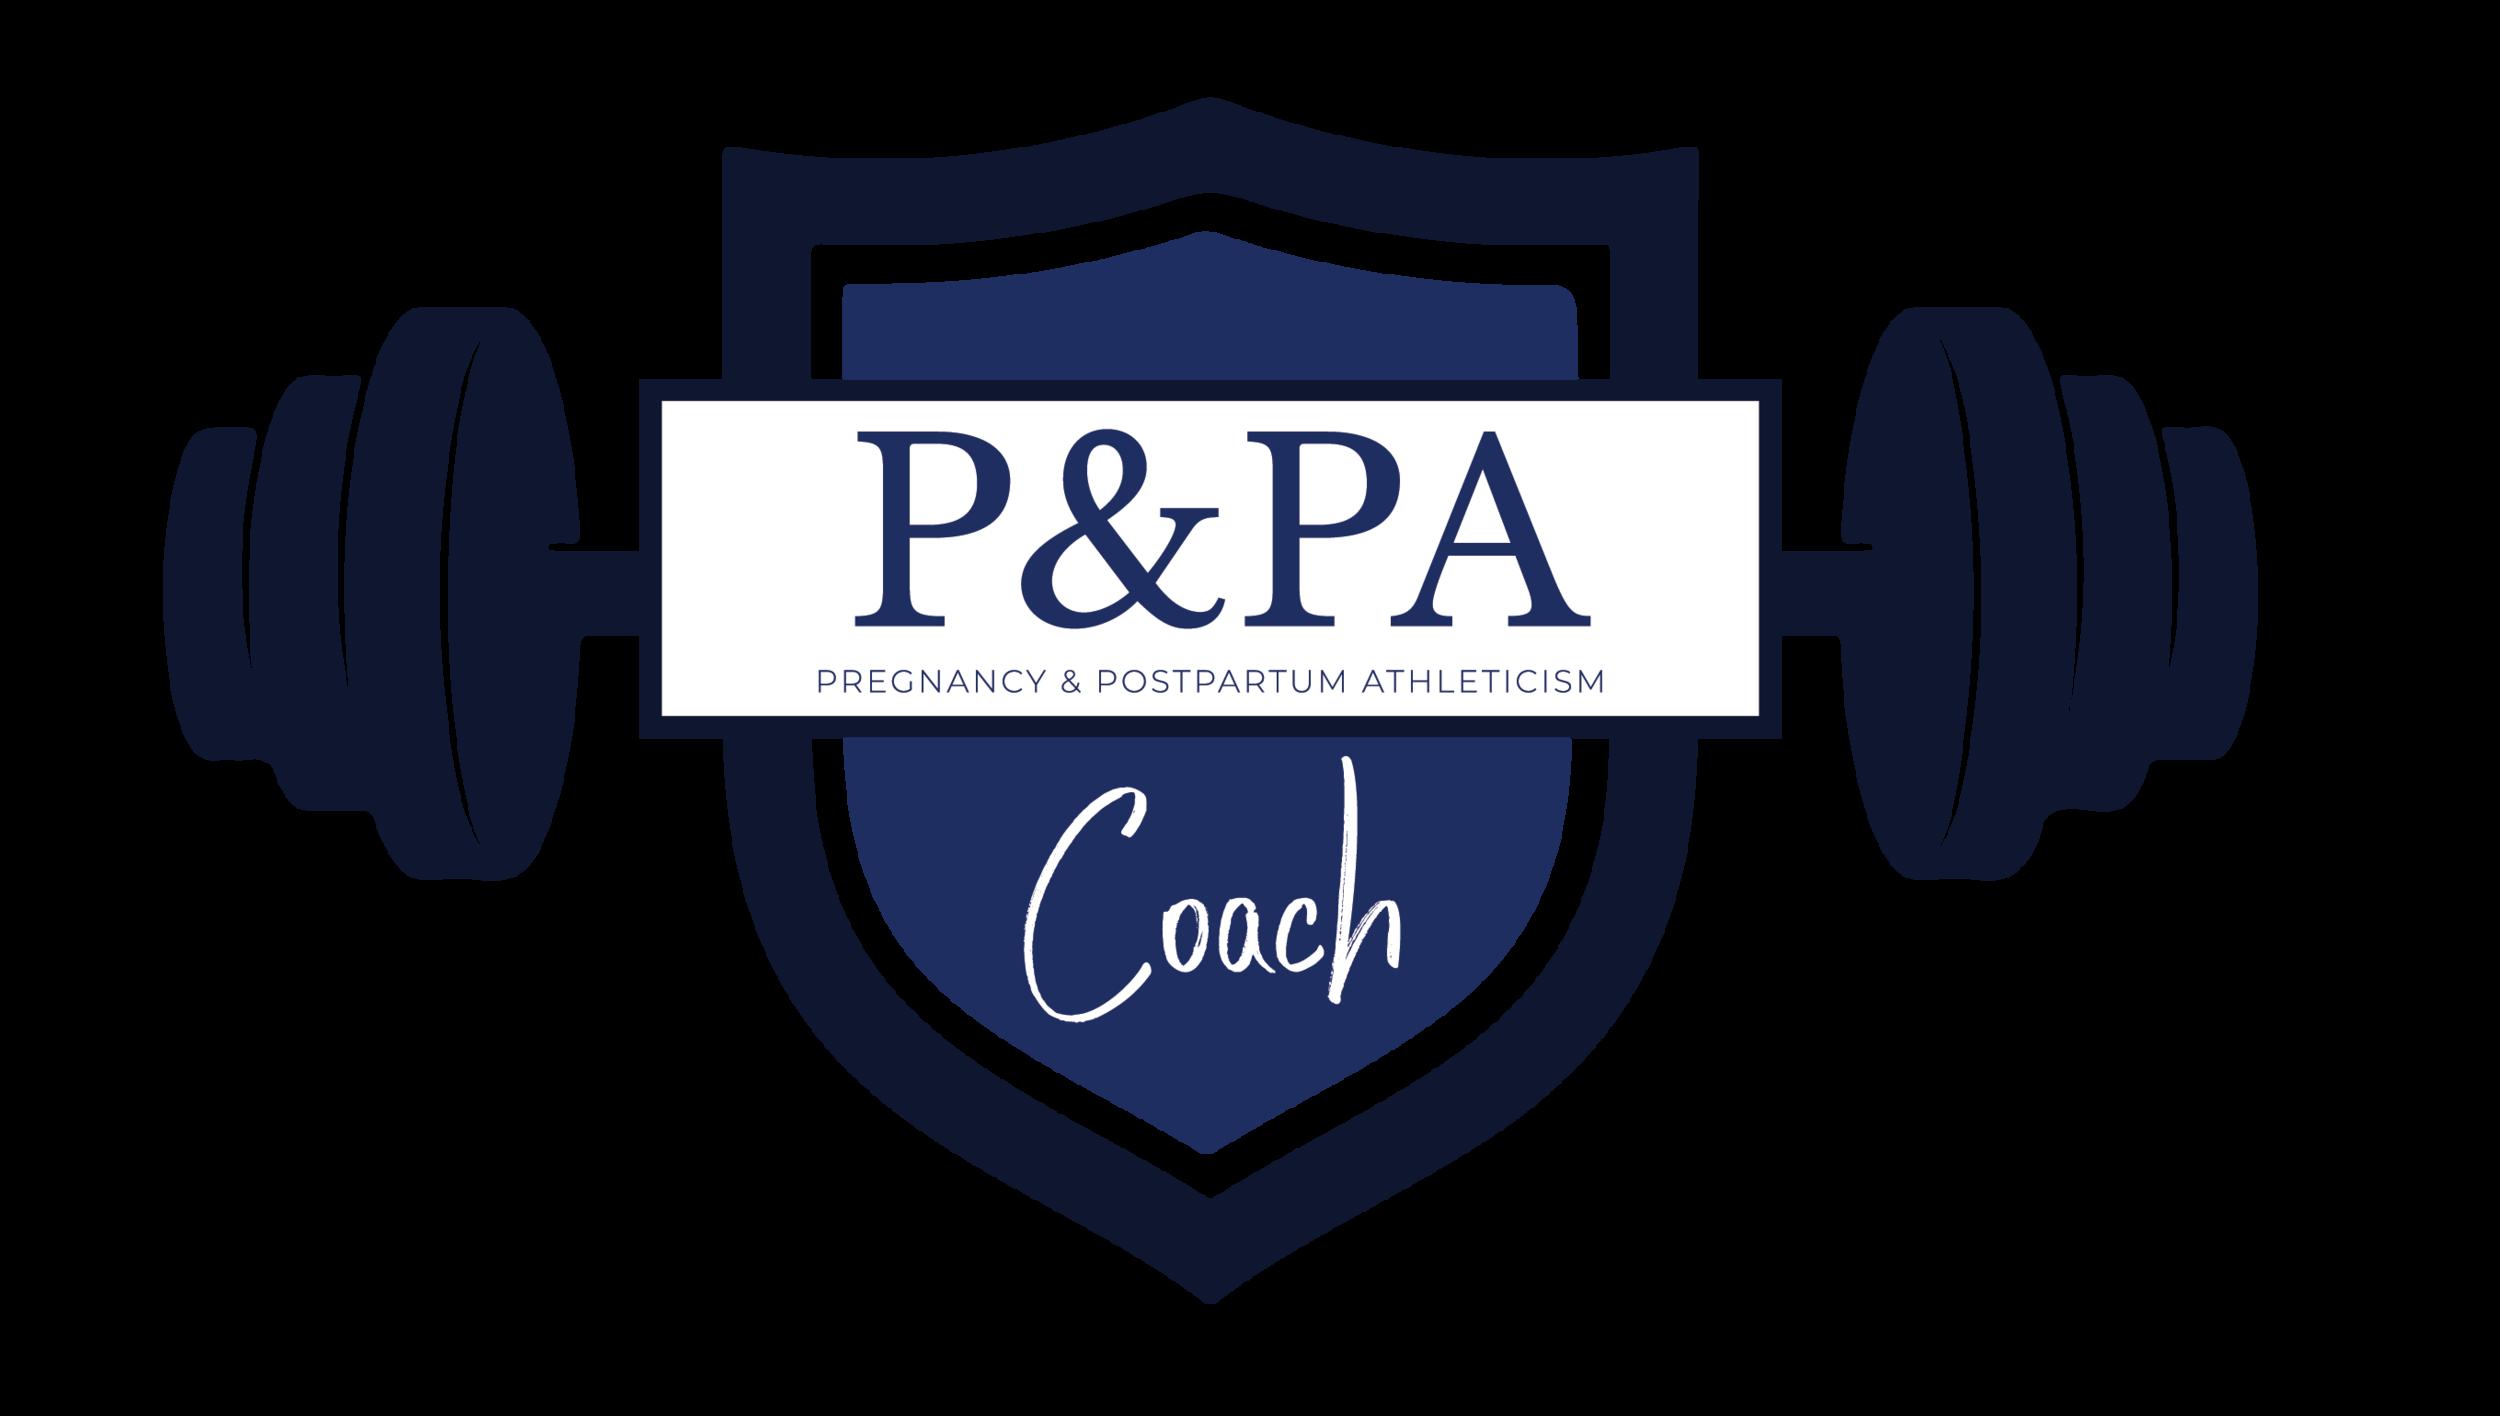 Pregnancy andPostPartumAthleticism - Achieve your goals safely